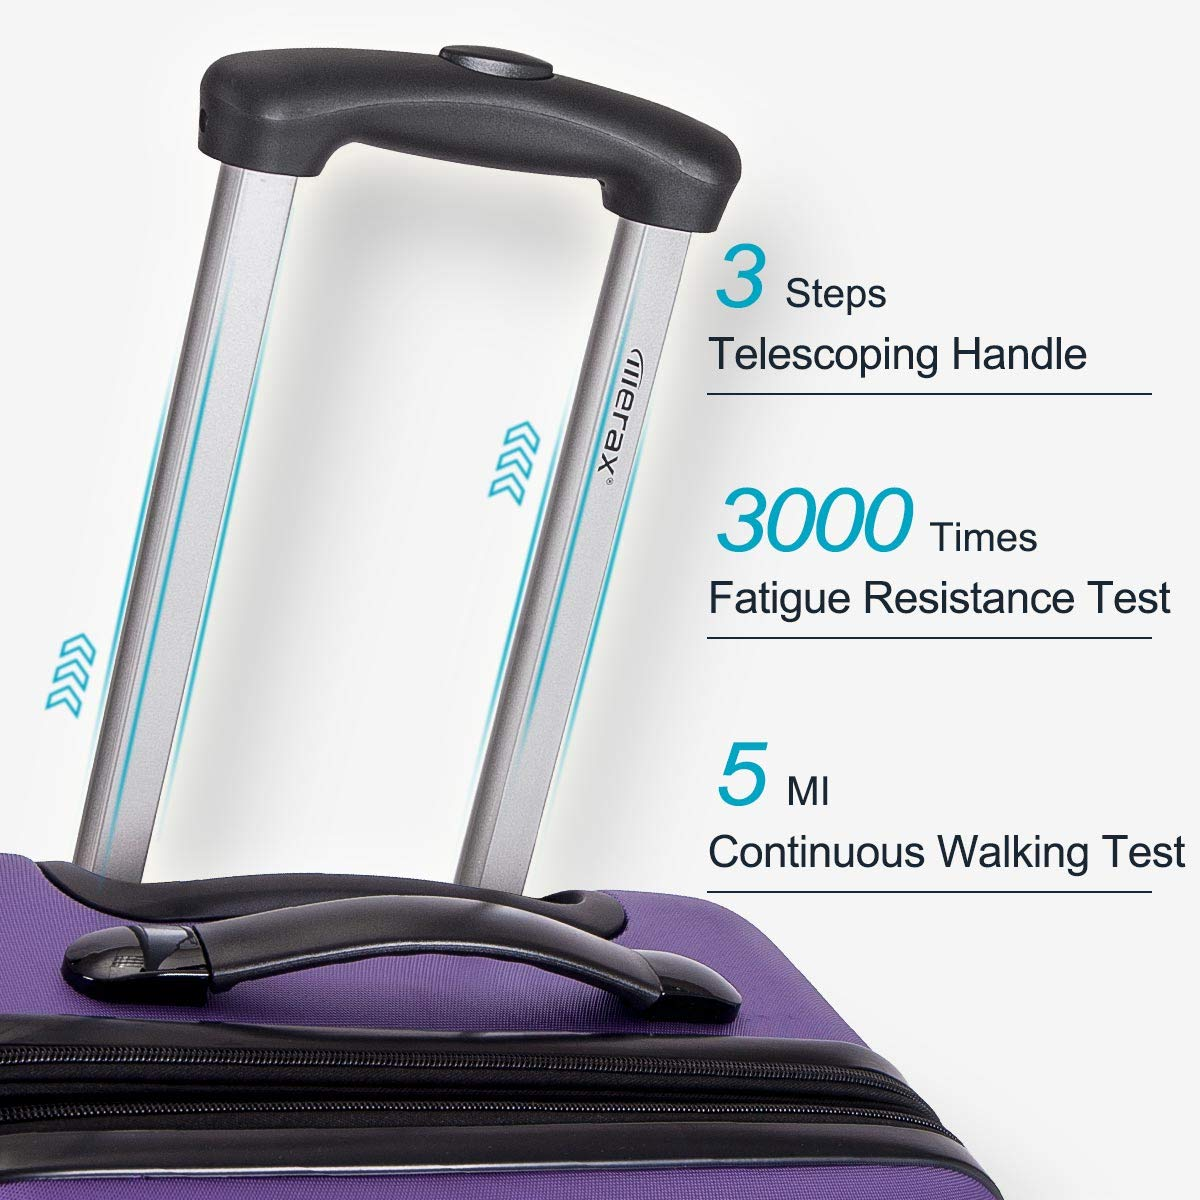 Classic Black Merax 3 Pcs Luggage Set Expandable Hardside Lightweight Spinner Suitcase